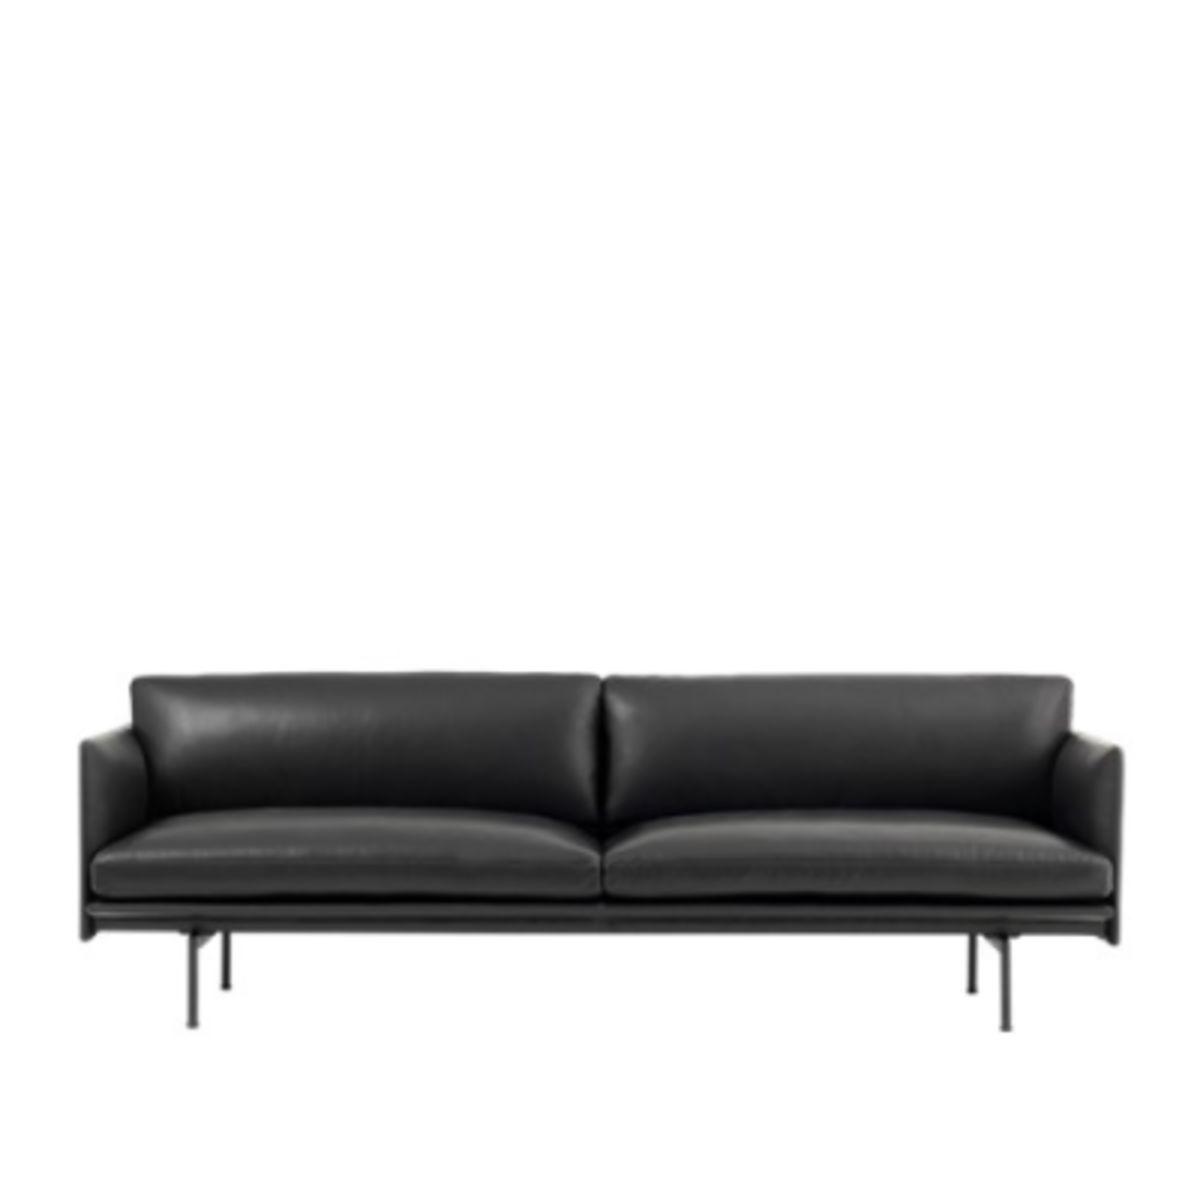 Shop Outline Sofa - 3 Seater 📎